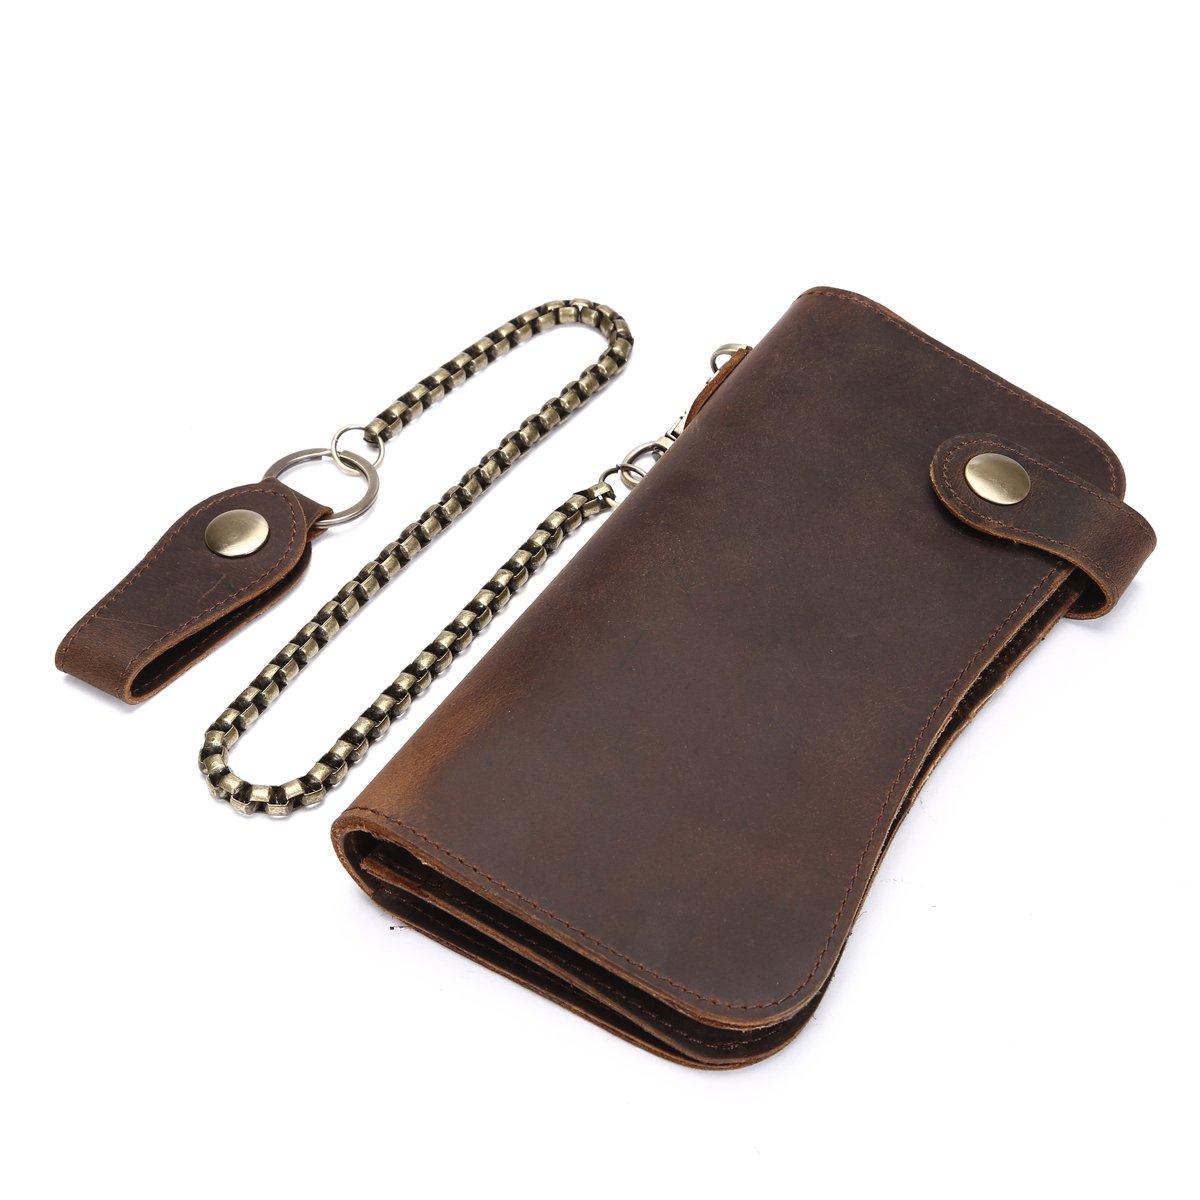 Itslife Men's RFID BLOCKING Chain Wallet Crazy Horse Leather Handmade Credit Card Holder